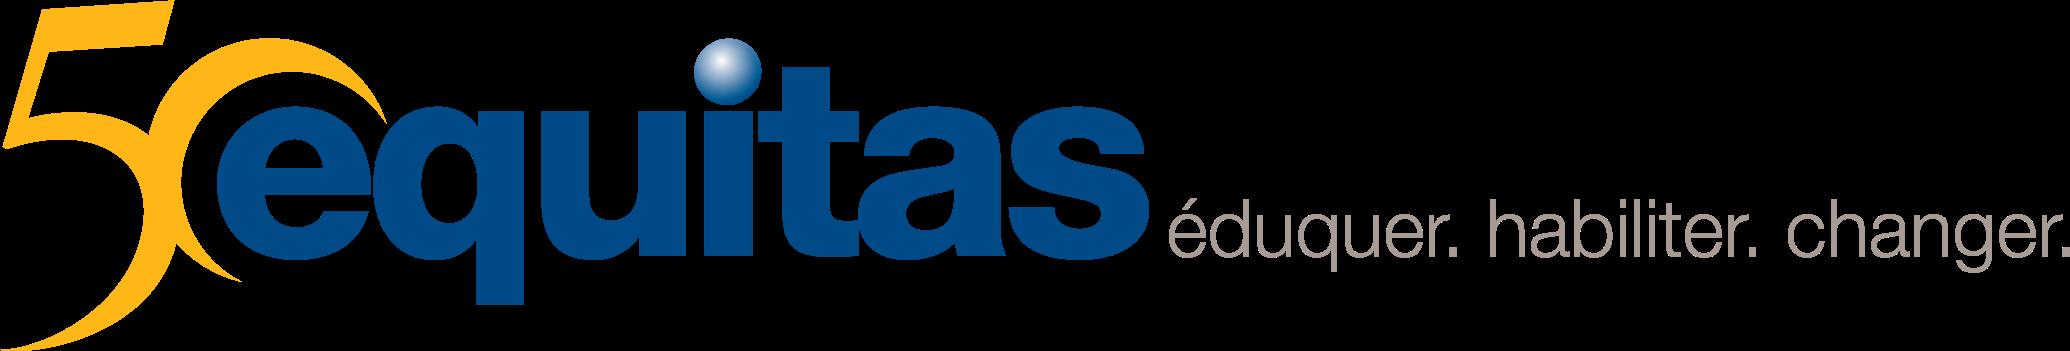 logo 50e anniversaire Equitas éduquer habileter changer